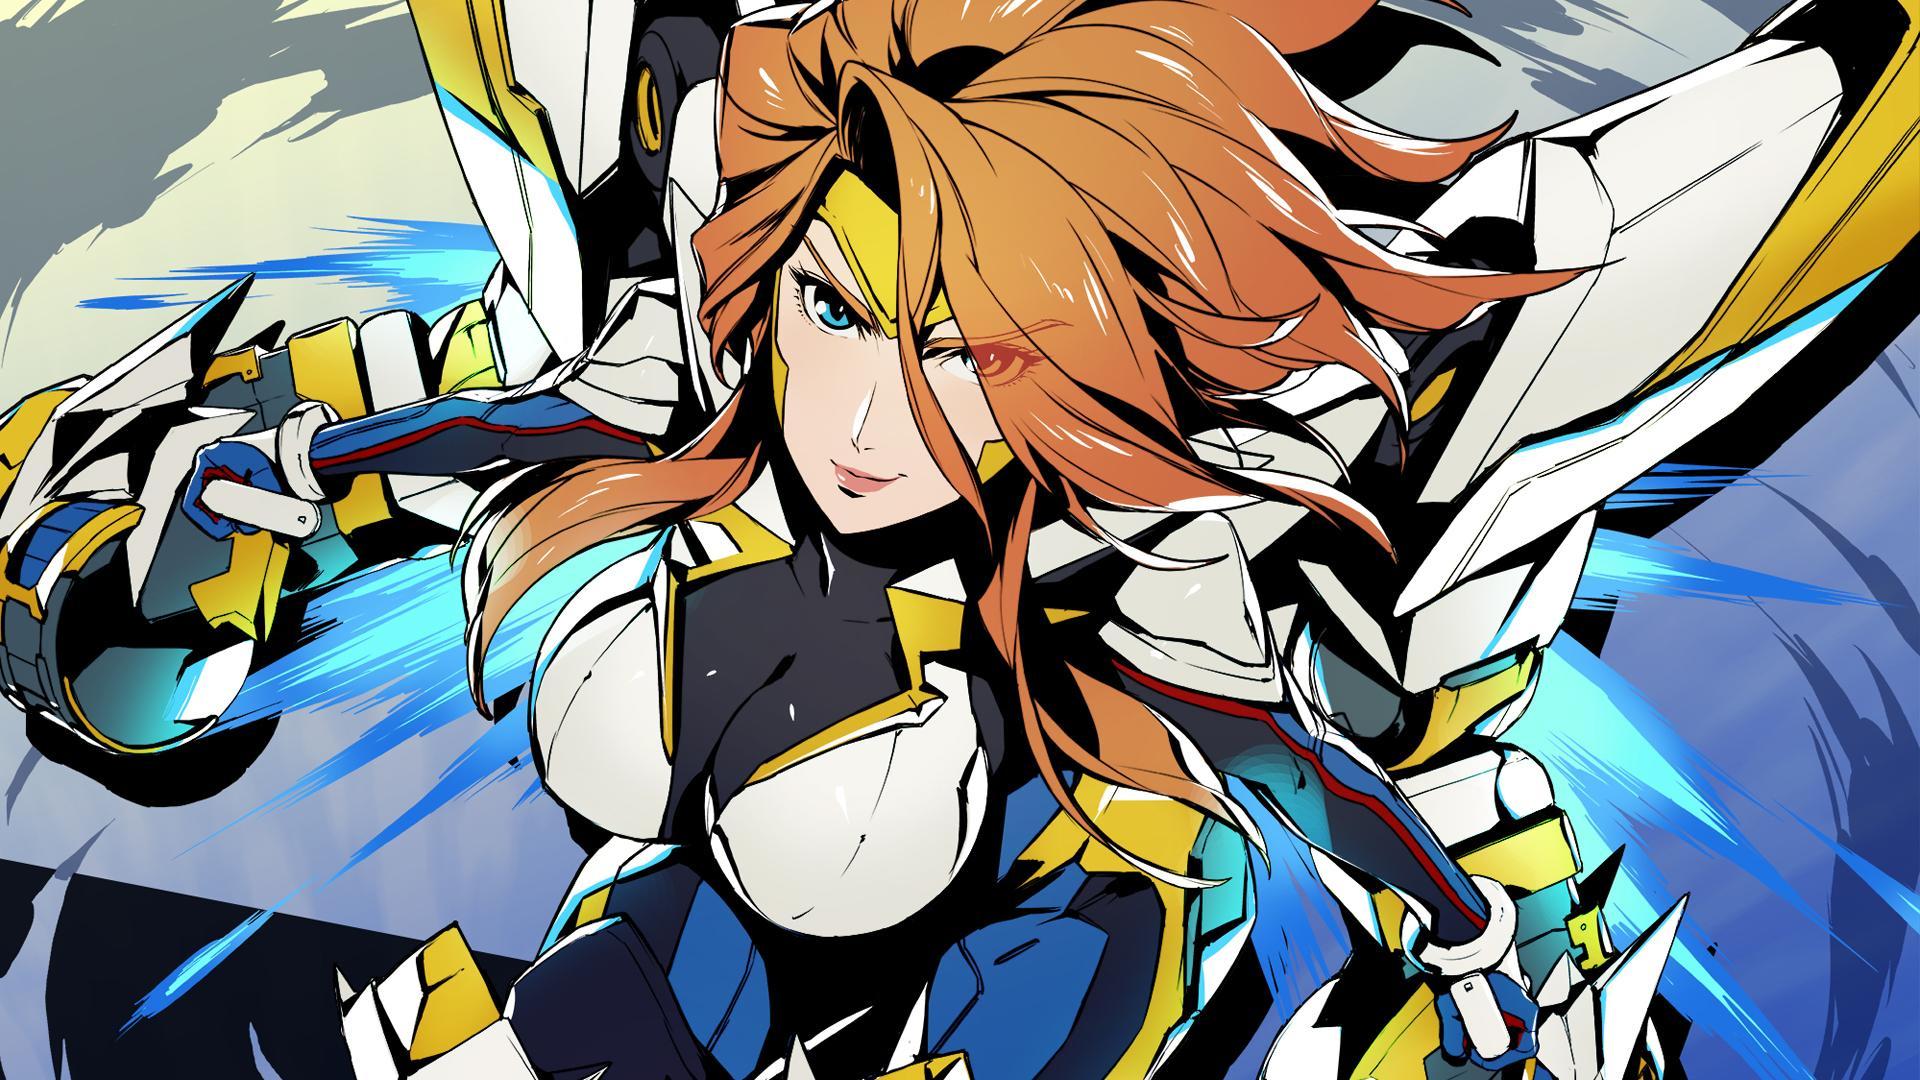 Riot Japan Has Released Anime Inspired Wallpapers Of Gun Goddess